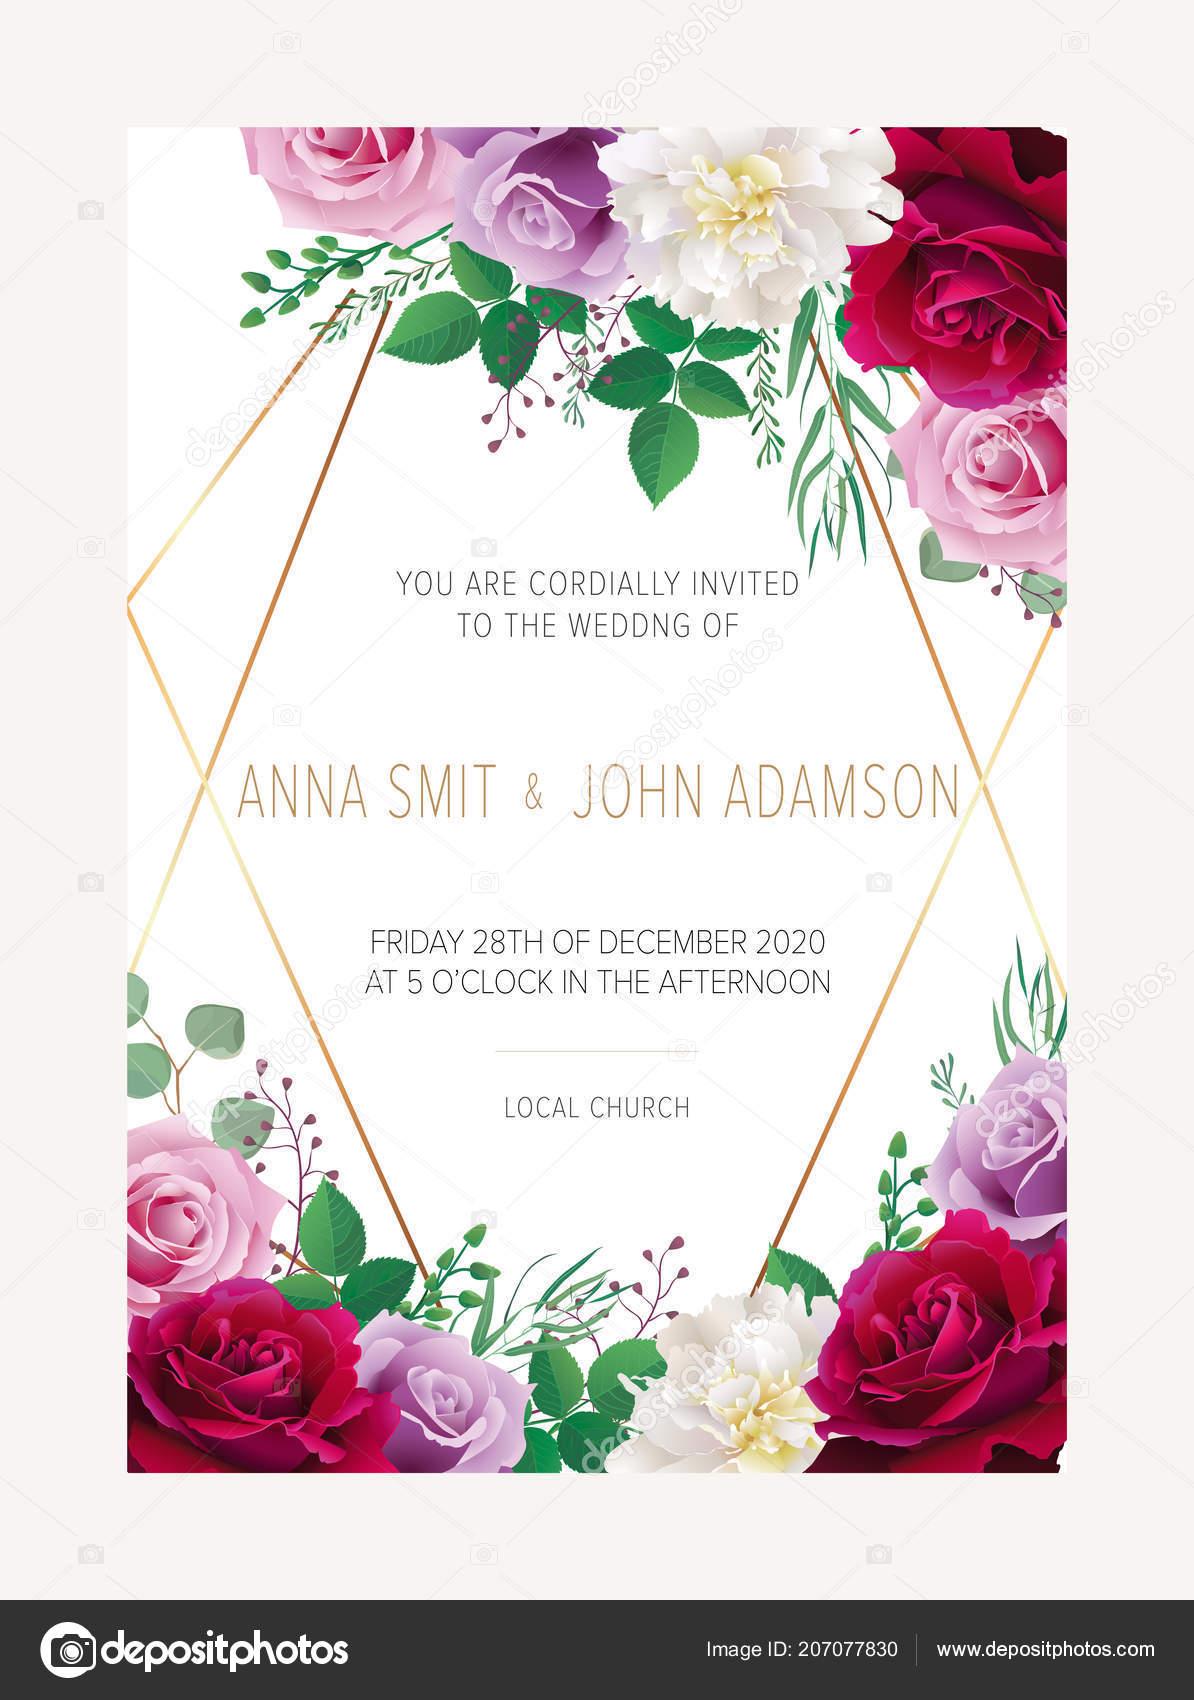 Wedding floral invitation date card design burgundy red purple wedding floral invitation date card design burgundy red purple garden vetores de stock stopboris Images